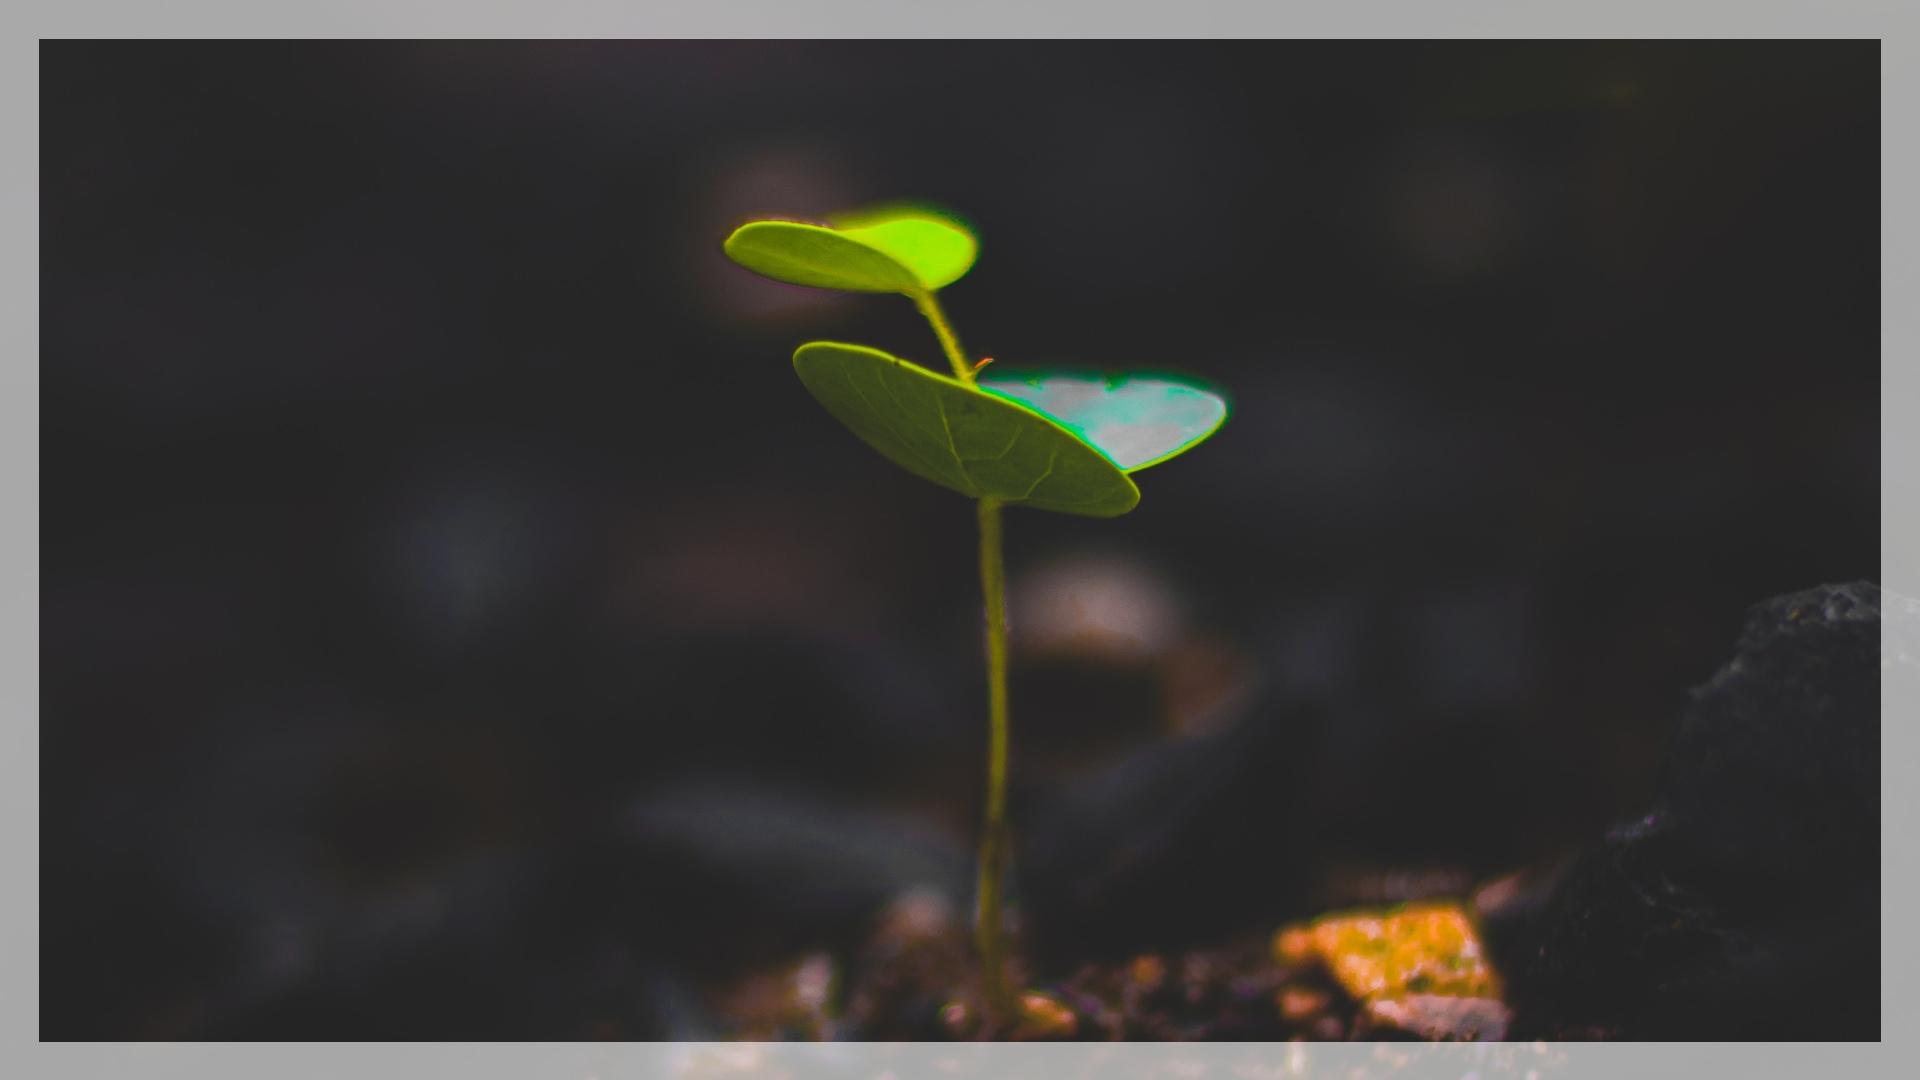 sme-financial-leadership-managing-growth